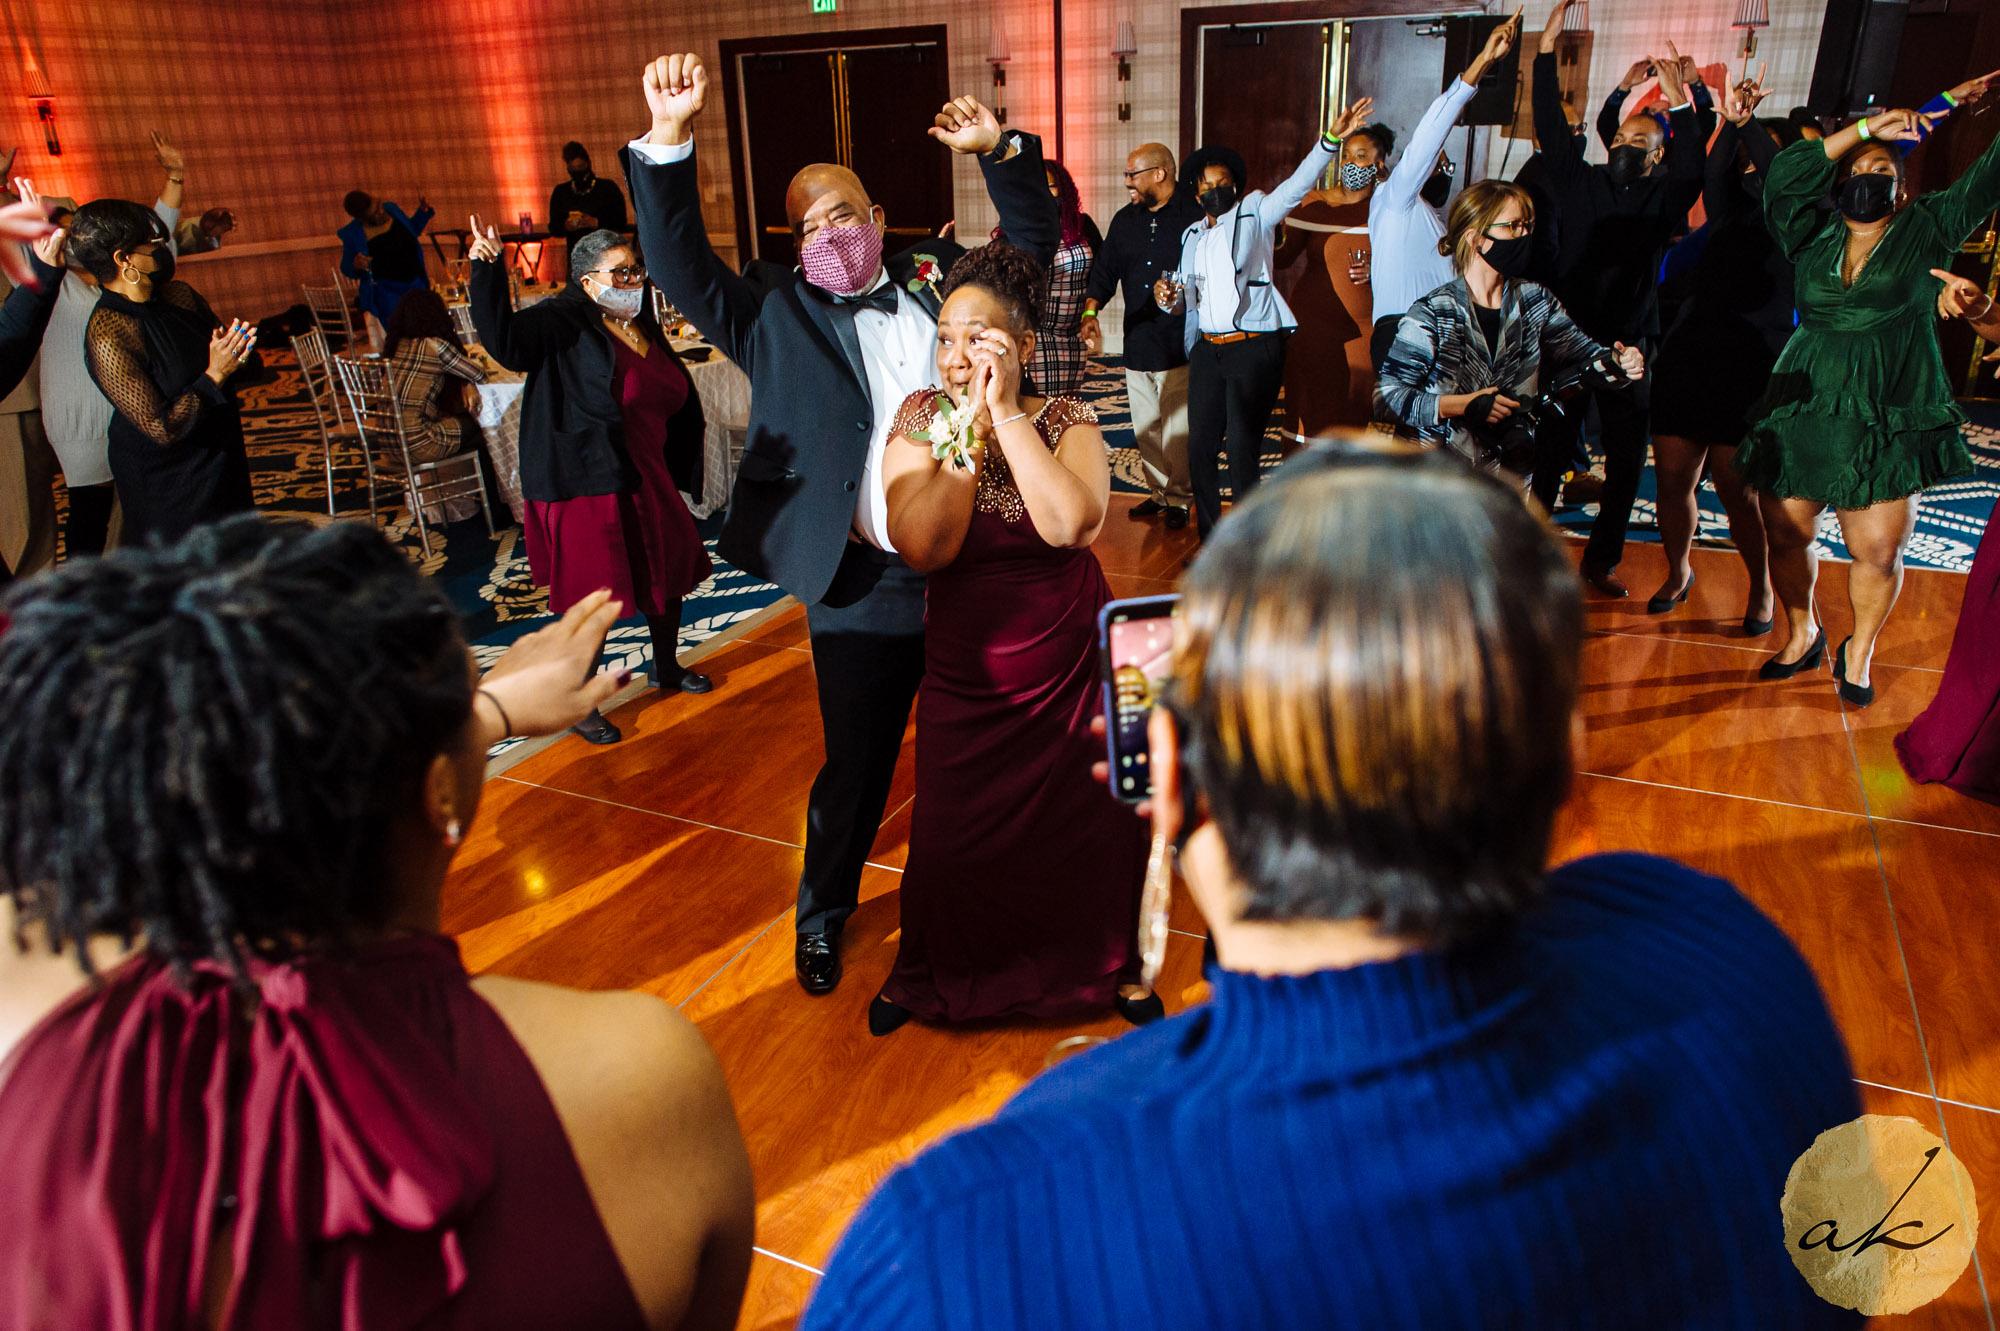 graduate annapolis hotel wedding